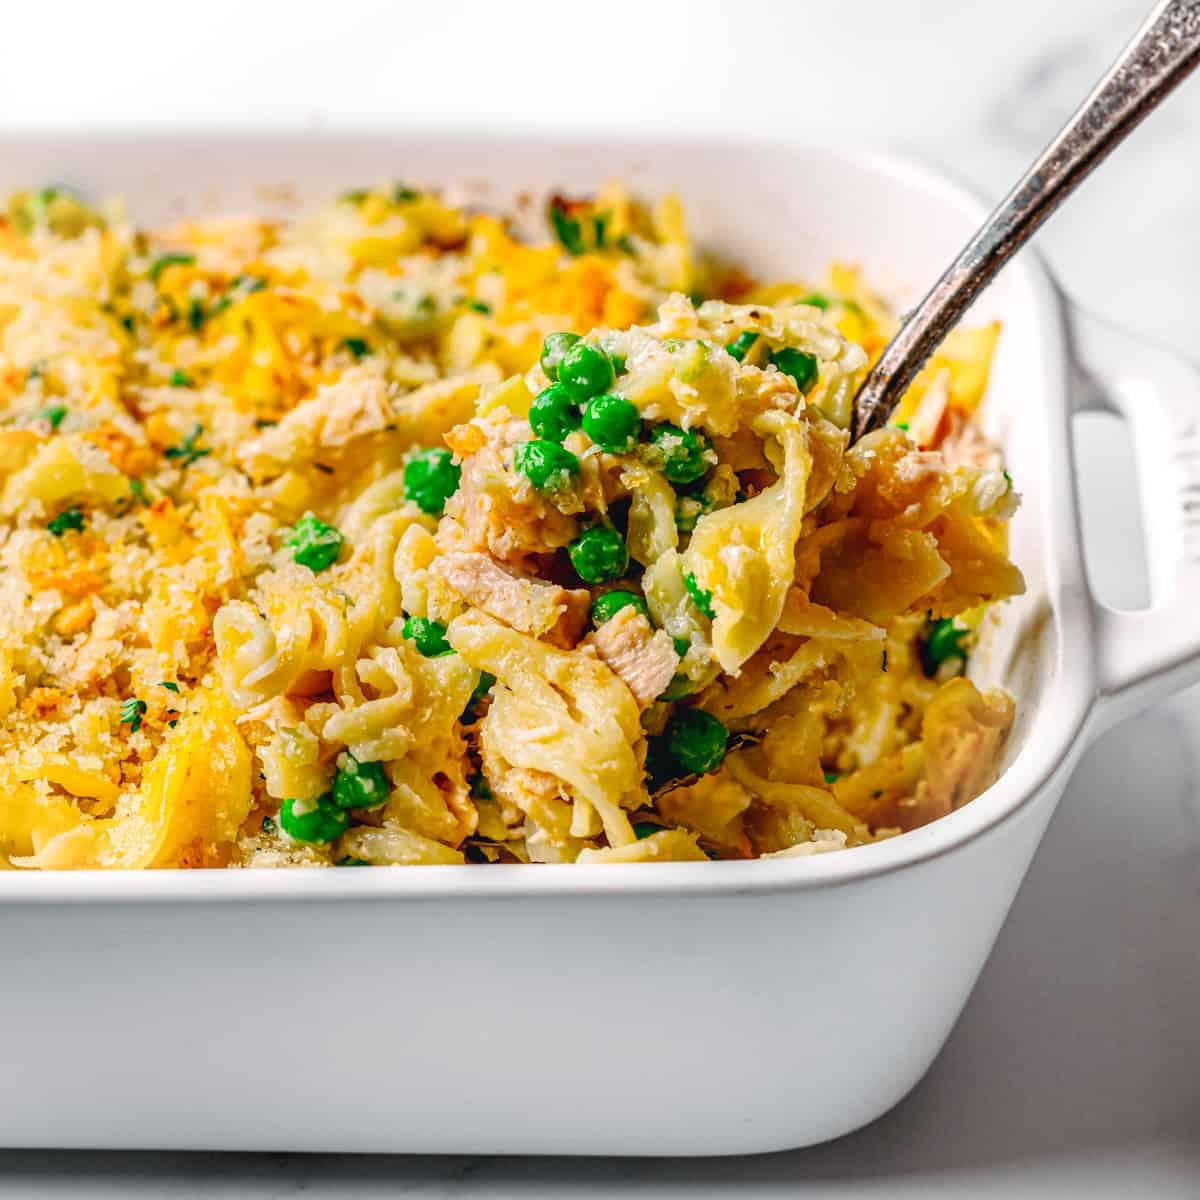 How to Make Easy Tuna Casserole